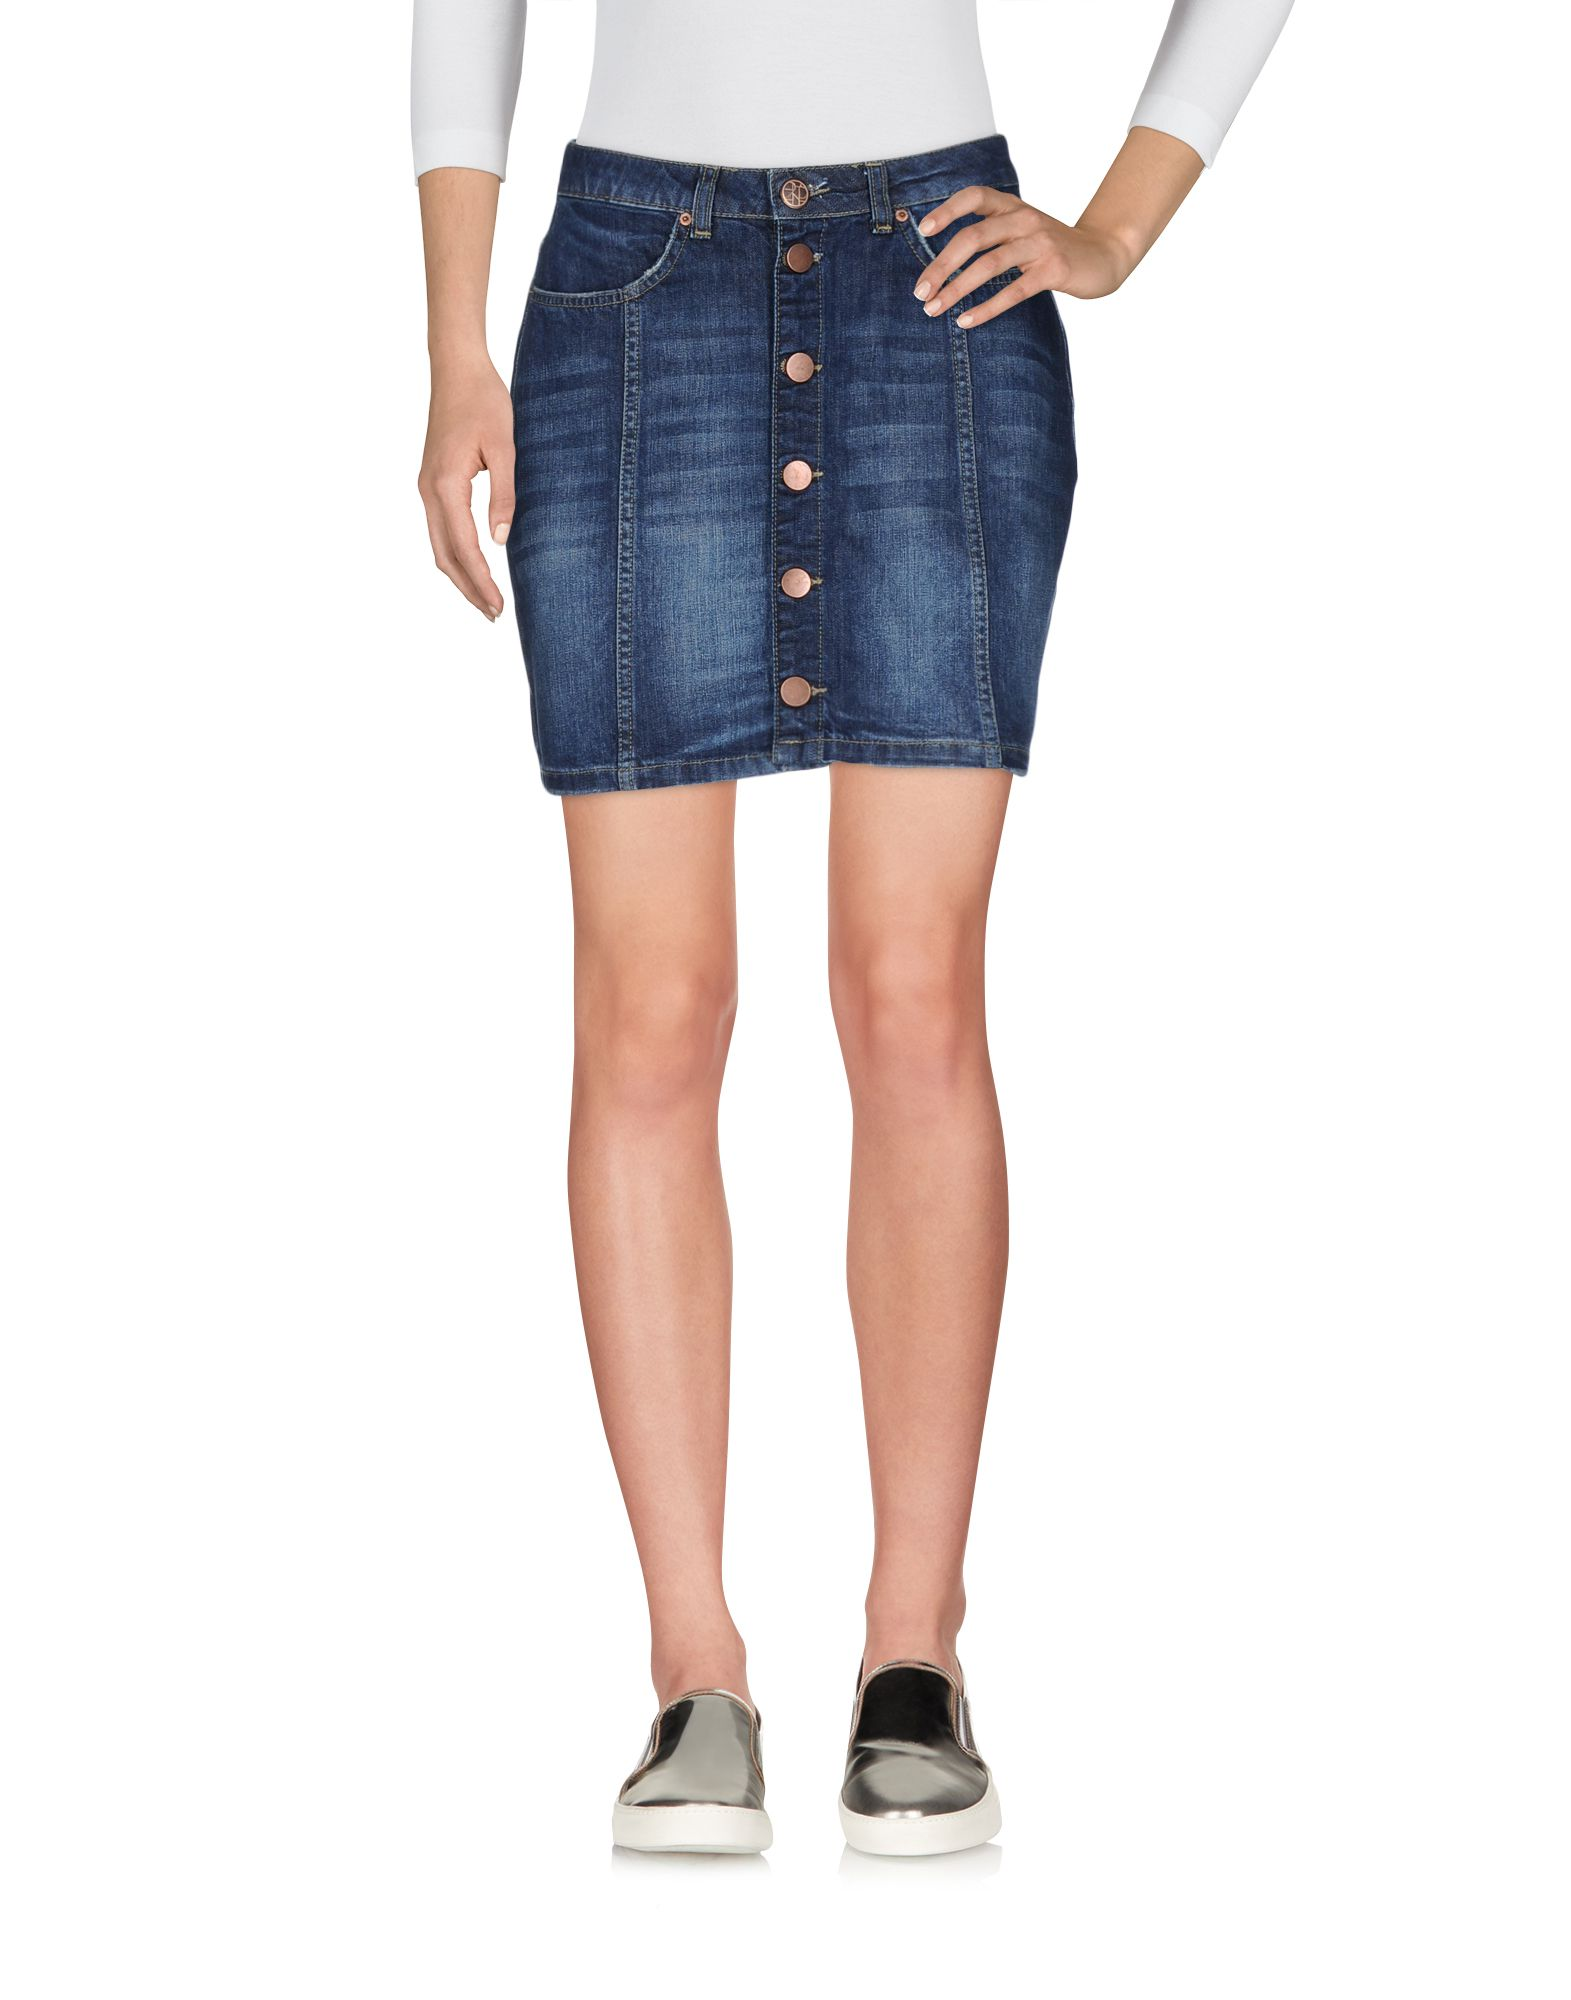 2ND ONE Damen Jeansrock Farbe Blau Größe 4